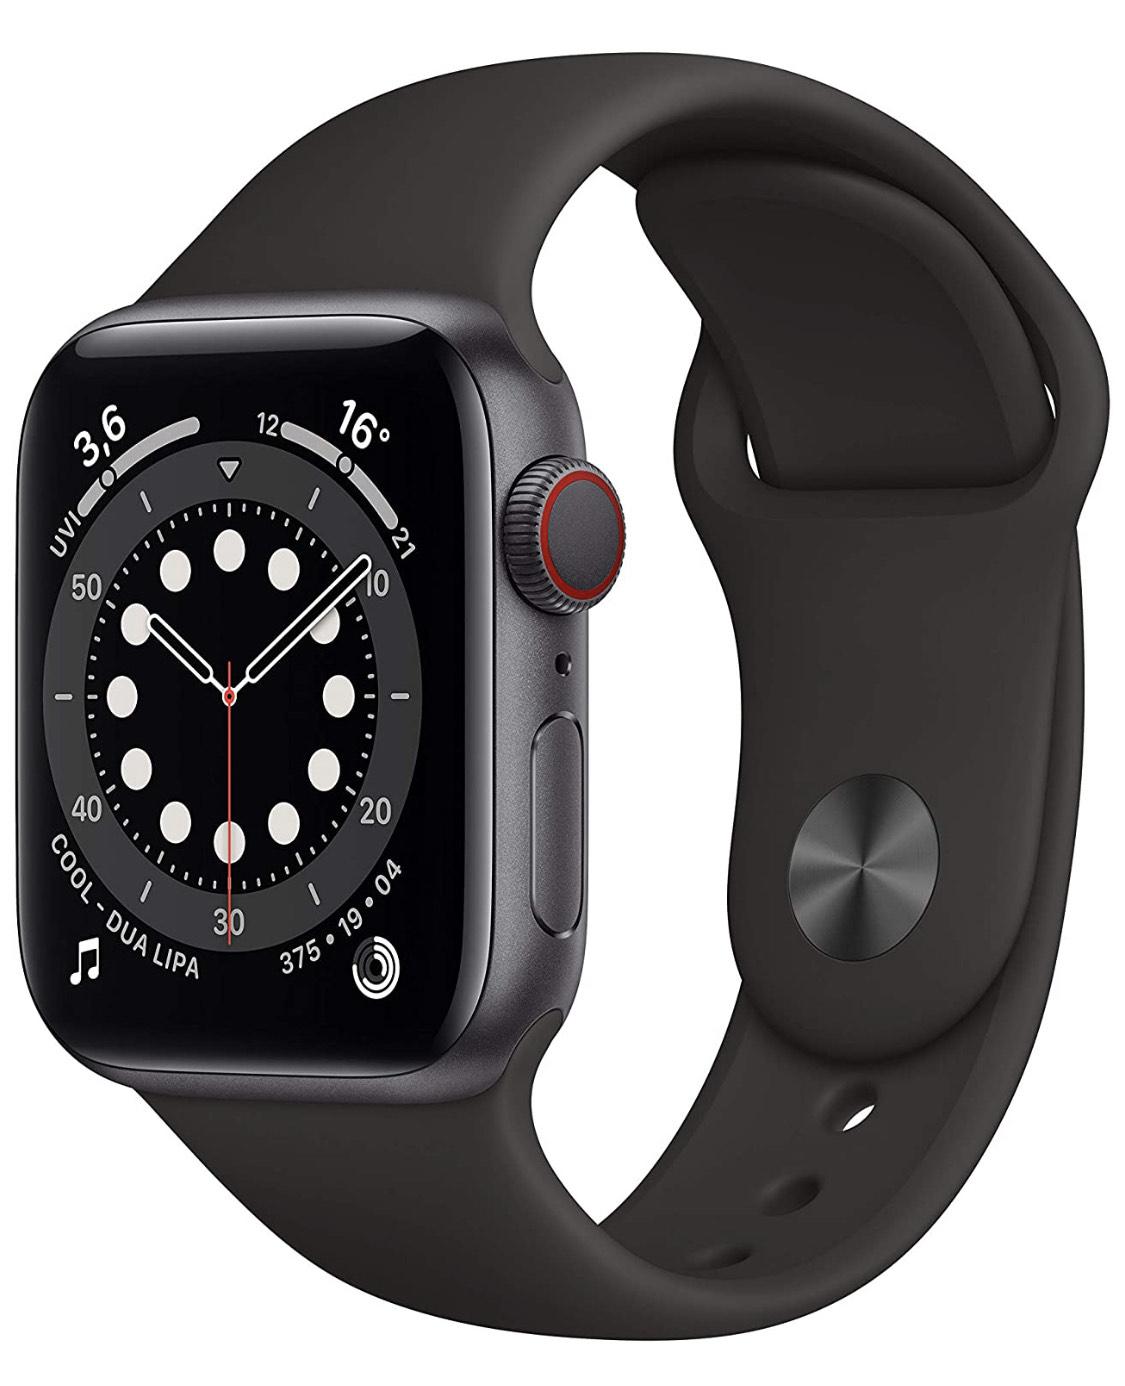 Apple Watch 6 (GPS + LTE) spacegrau 40mm